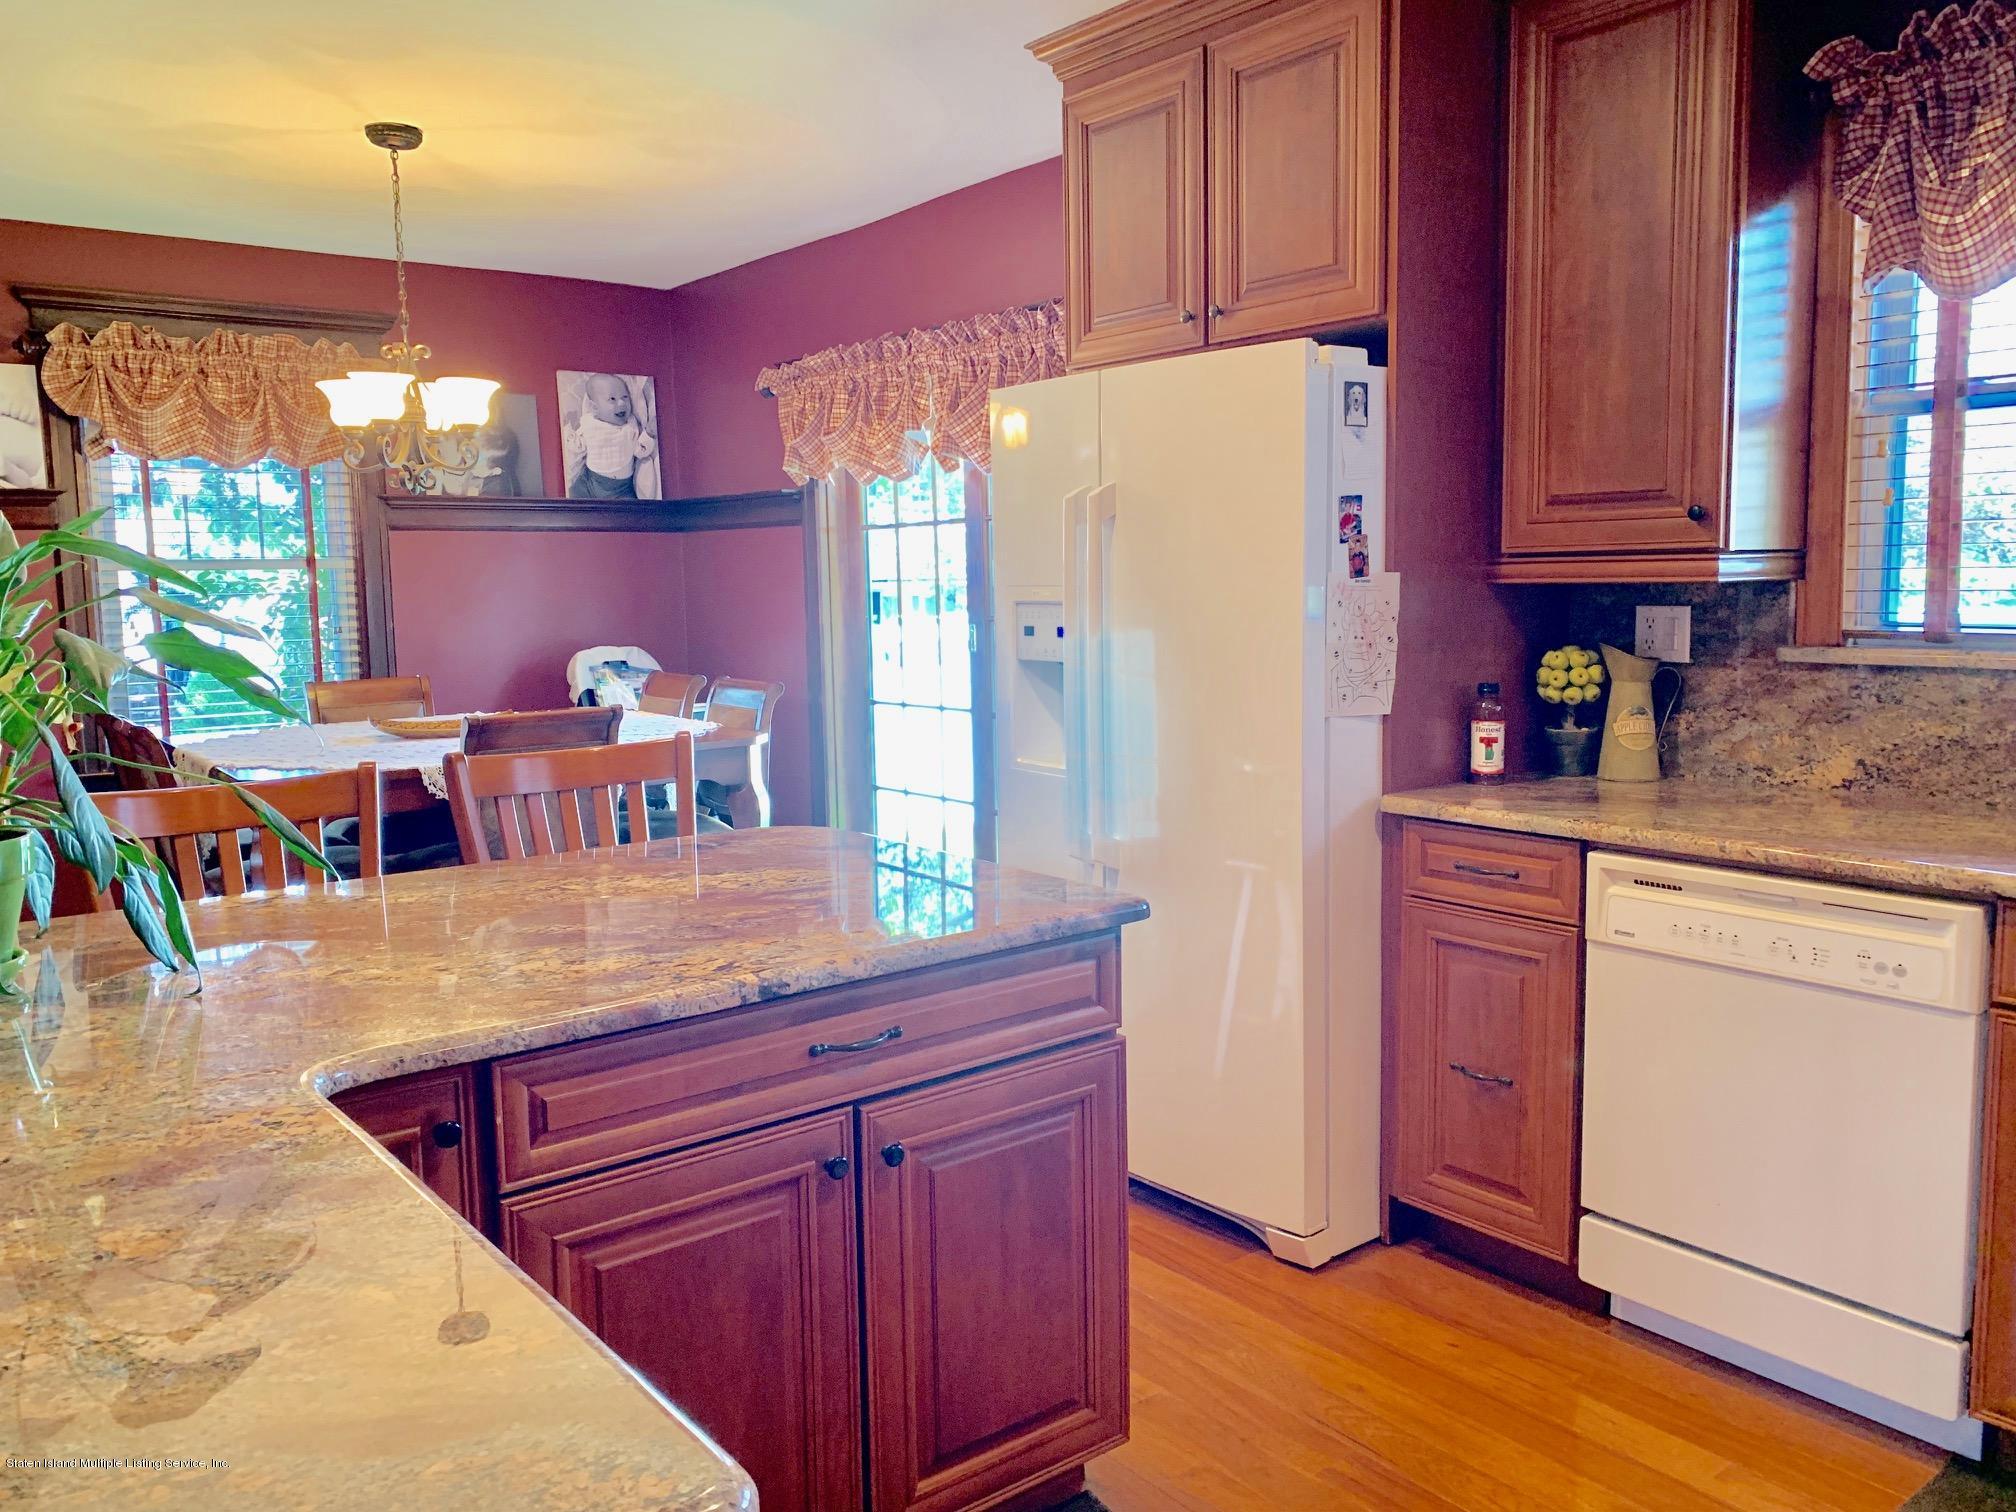 Single Family - Detached 195 Fairview Avenue  Staten Island, NY 10314, MLS-1132423-12